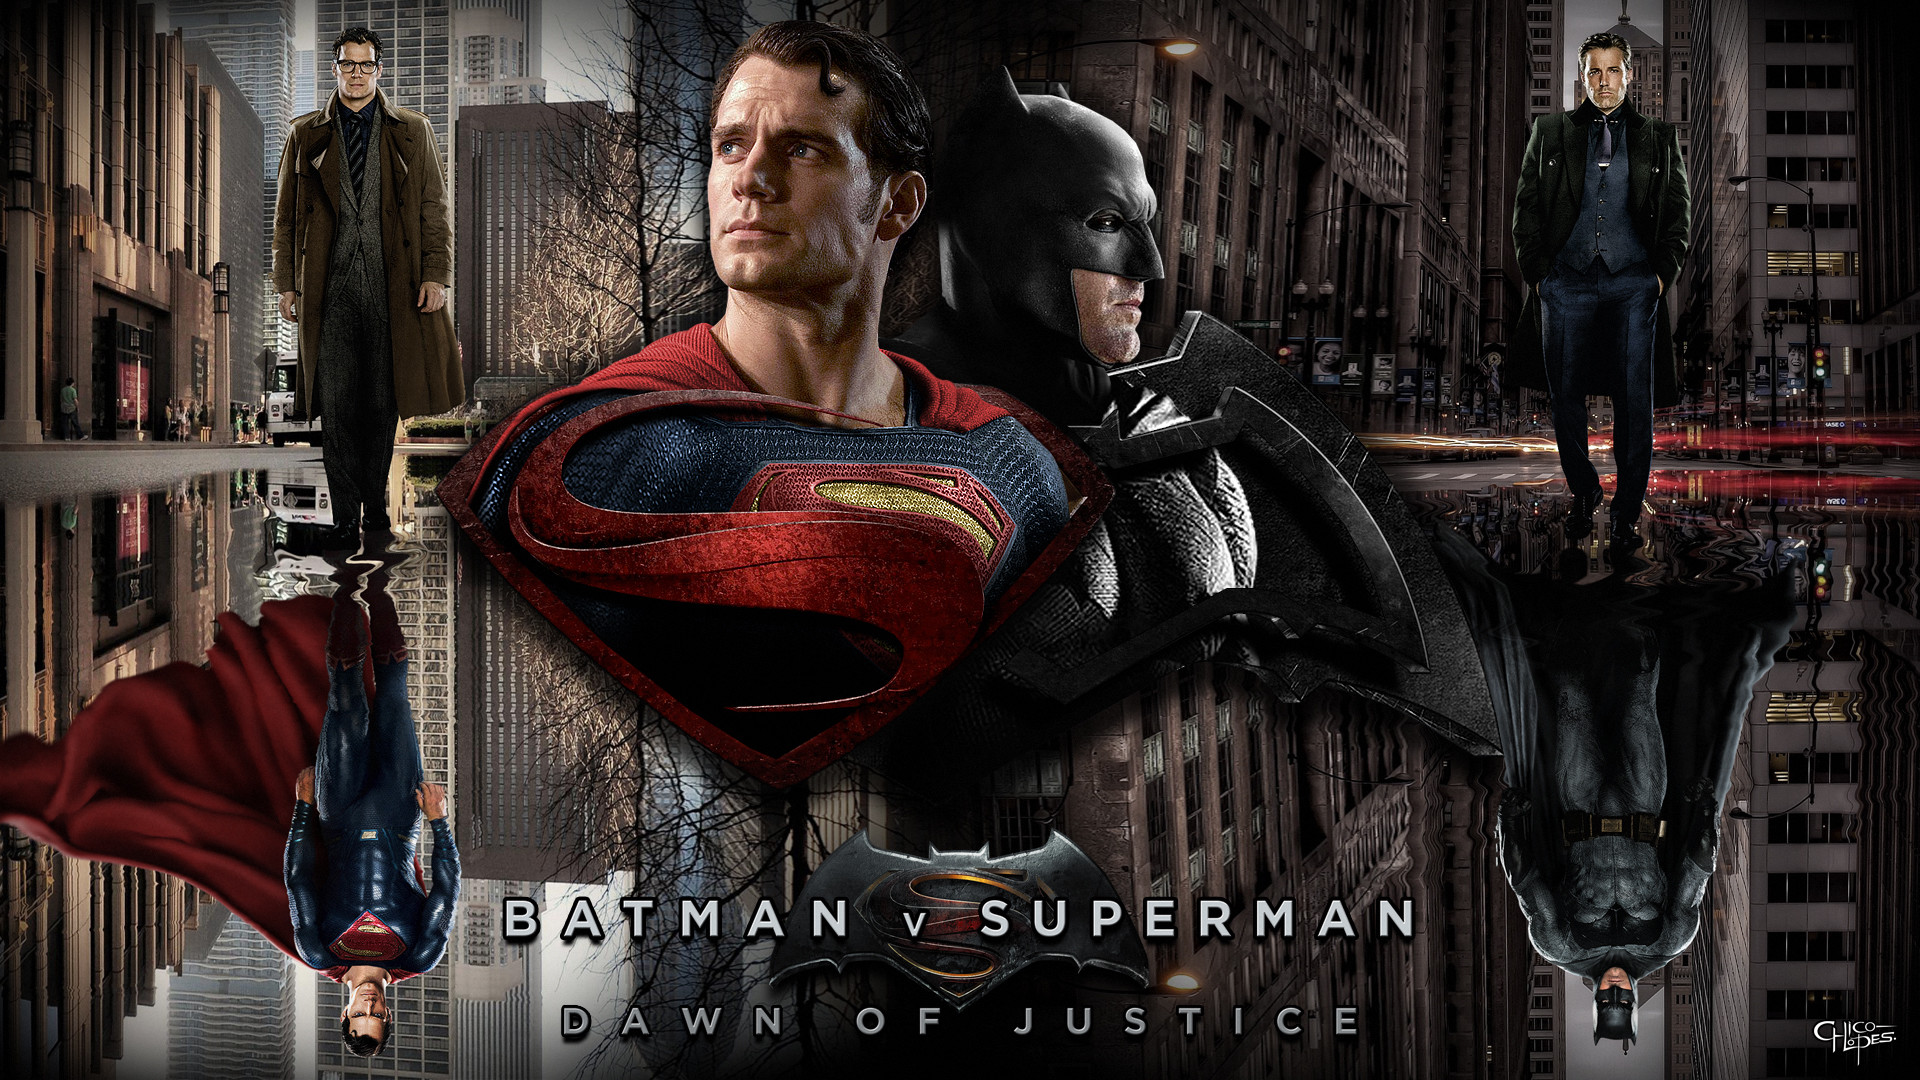 Batman v Superman Wallpaper 1080p by LoganChico.